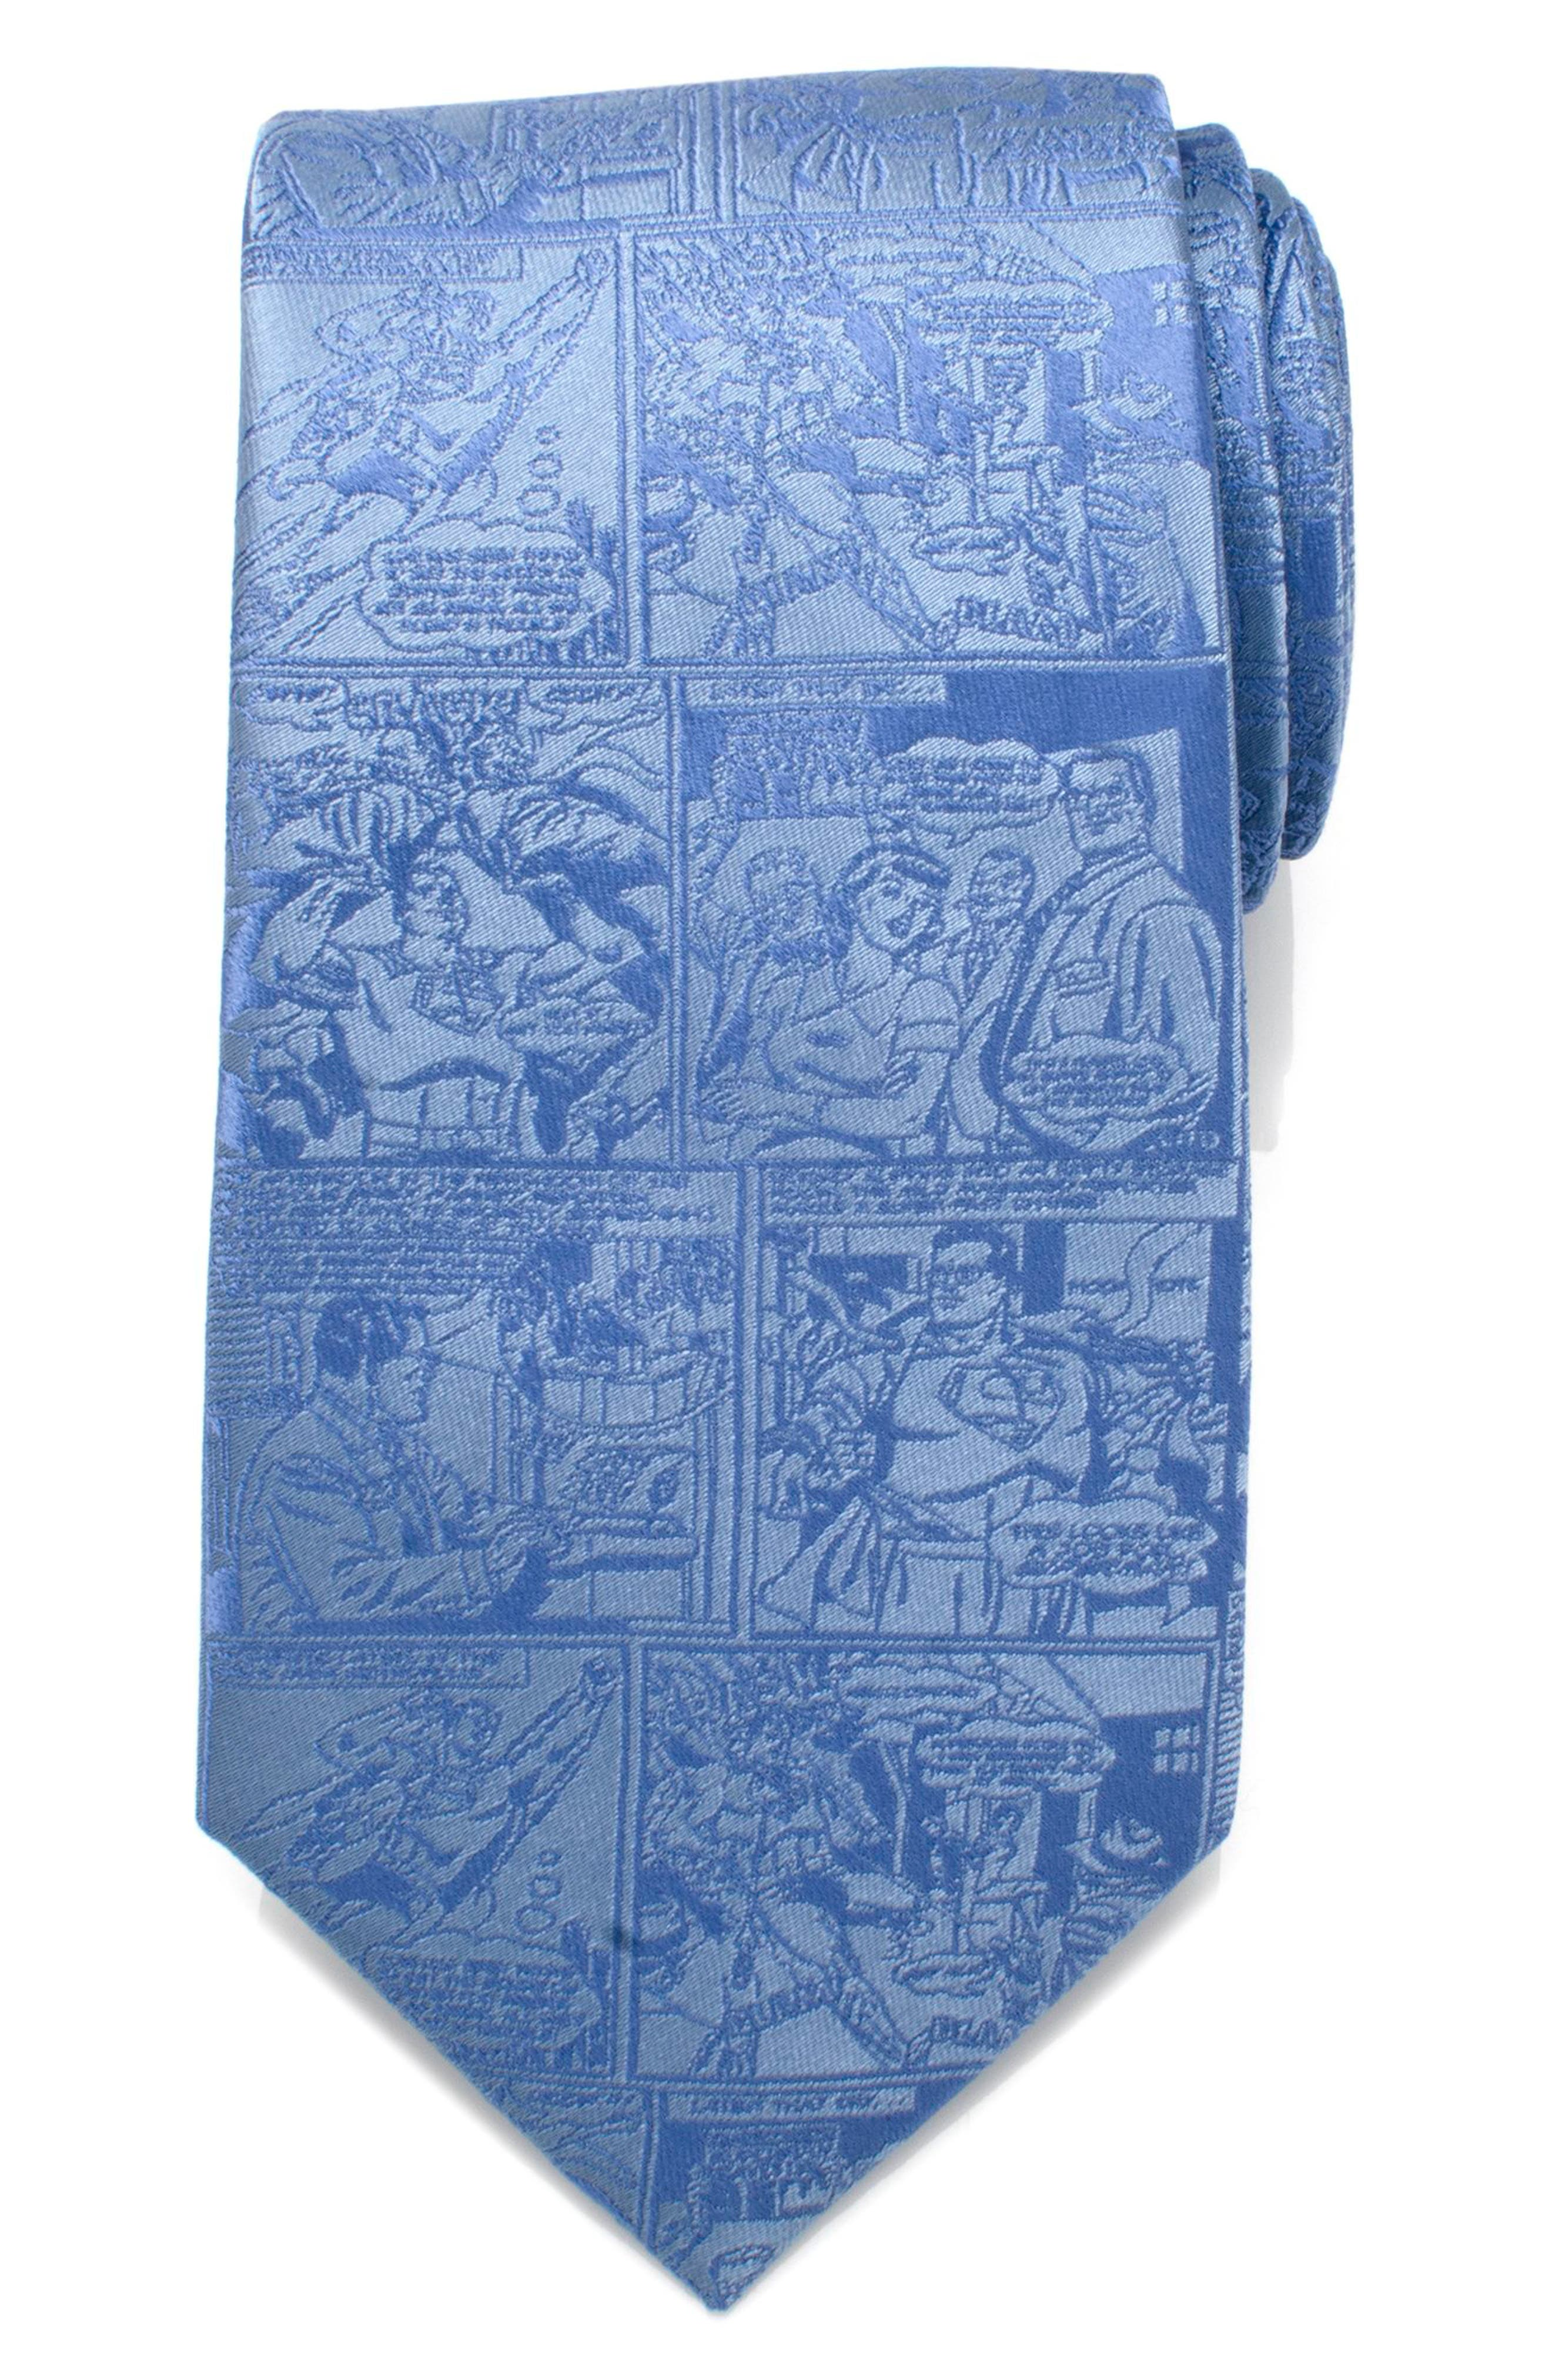 Superman Comic Silk Tie,                             Main thumbnail 1, color,                             Blue